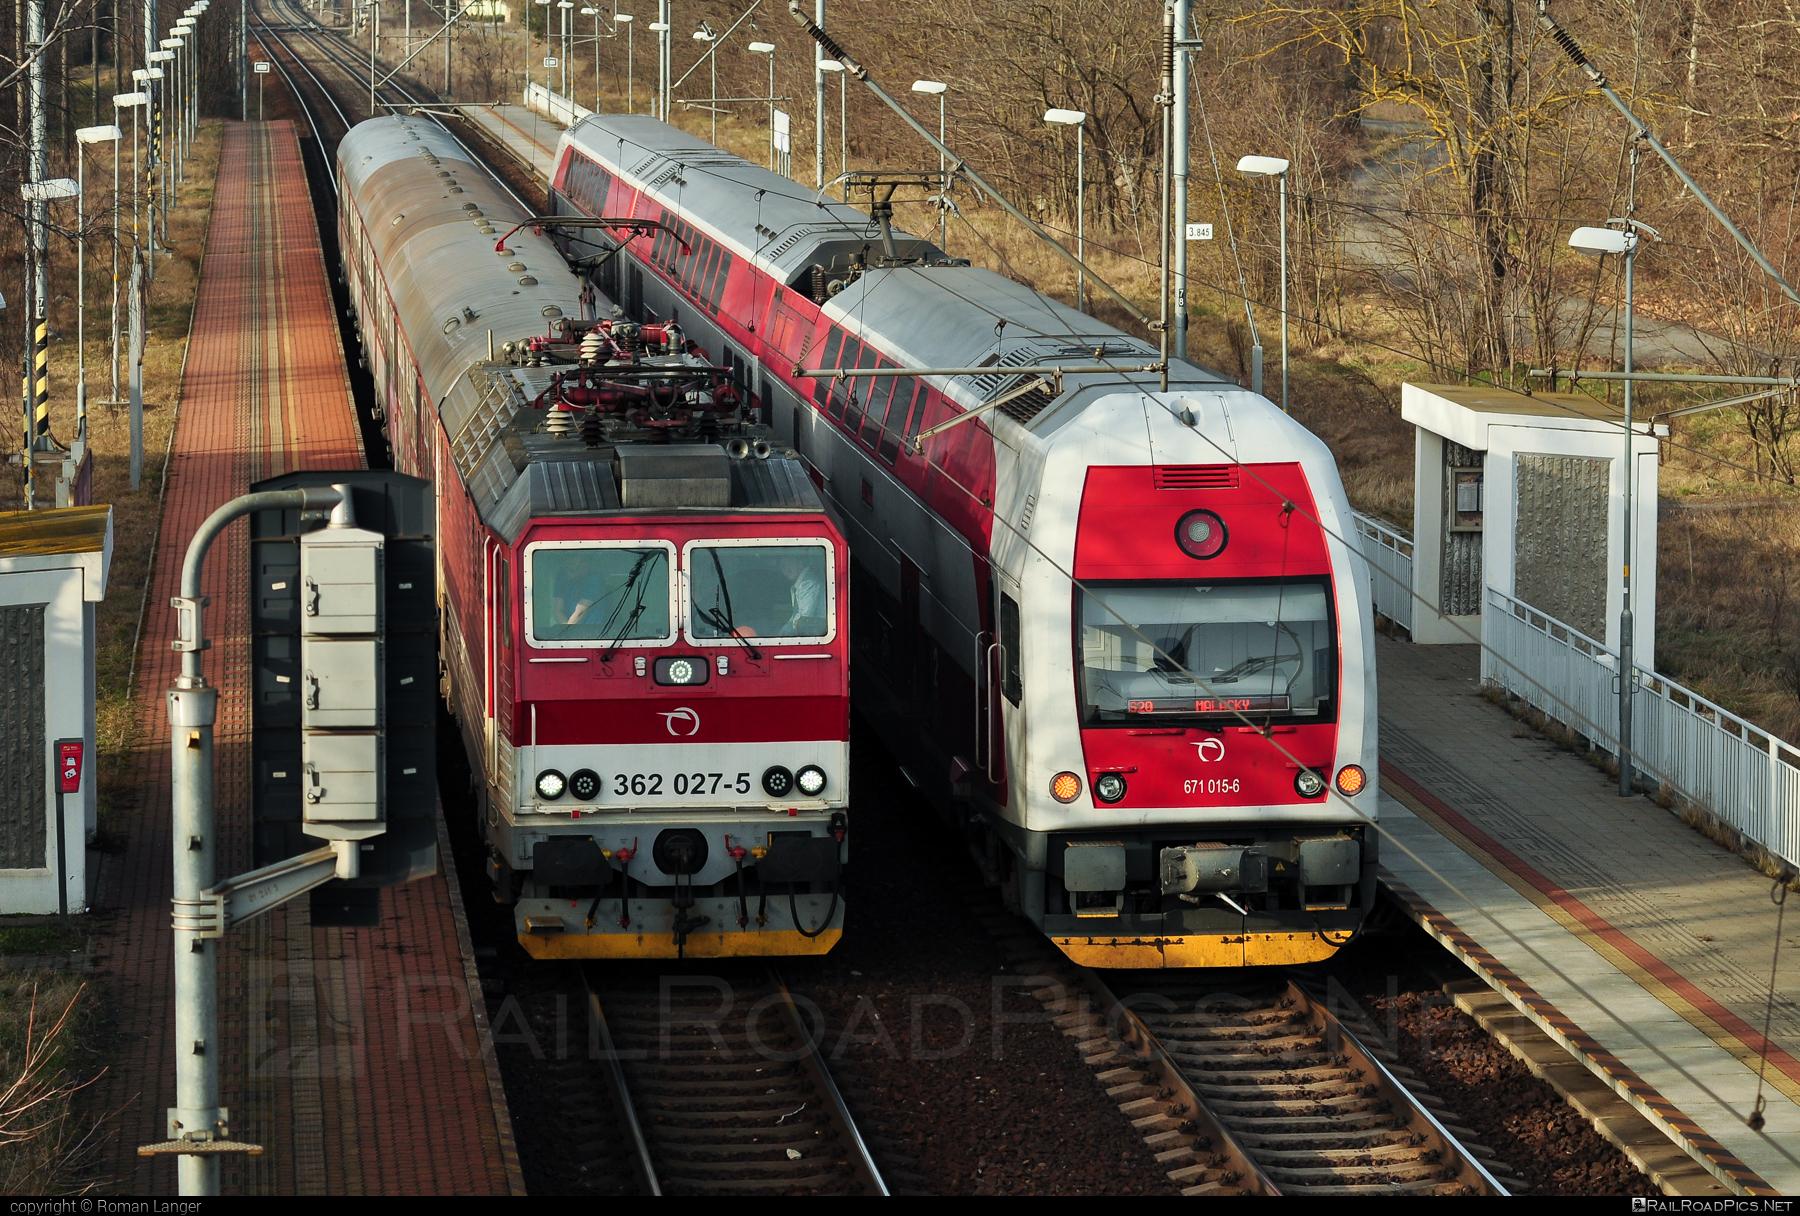 Škoda 69Er - 362 027-5 operated by Železničná Spoločnost' Slovensko, a.s. #ZeleznicnaSpolocnostSlovensko #eso #locomotive362 #rychleeso #skoda #skoda69er #zssk